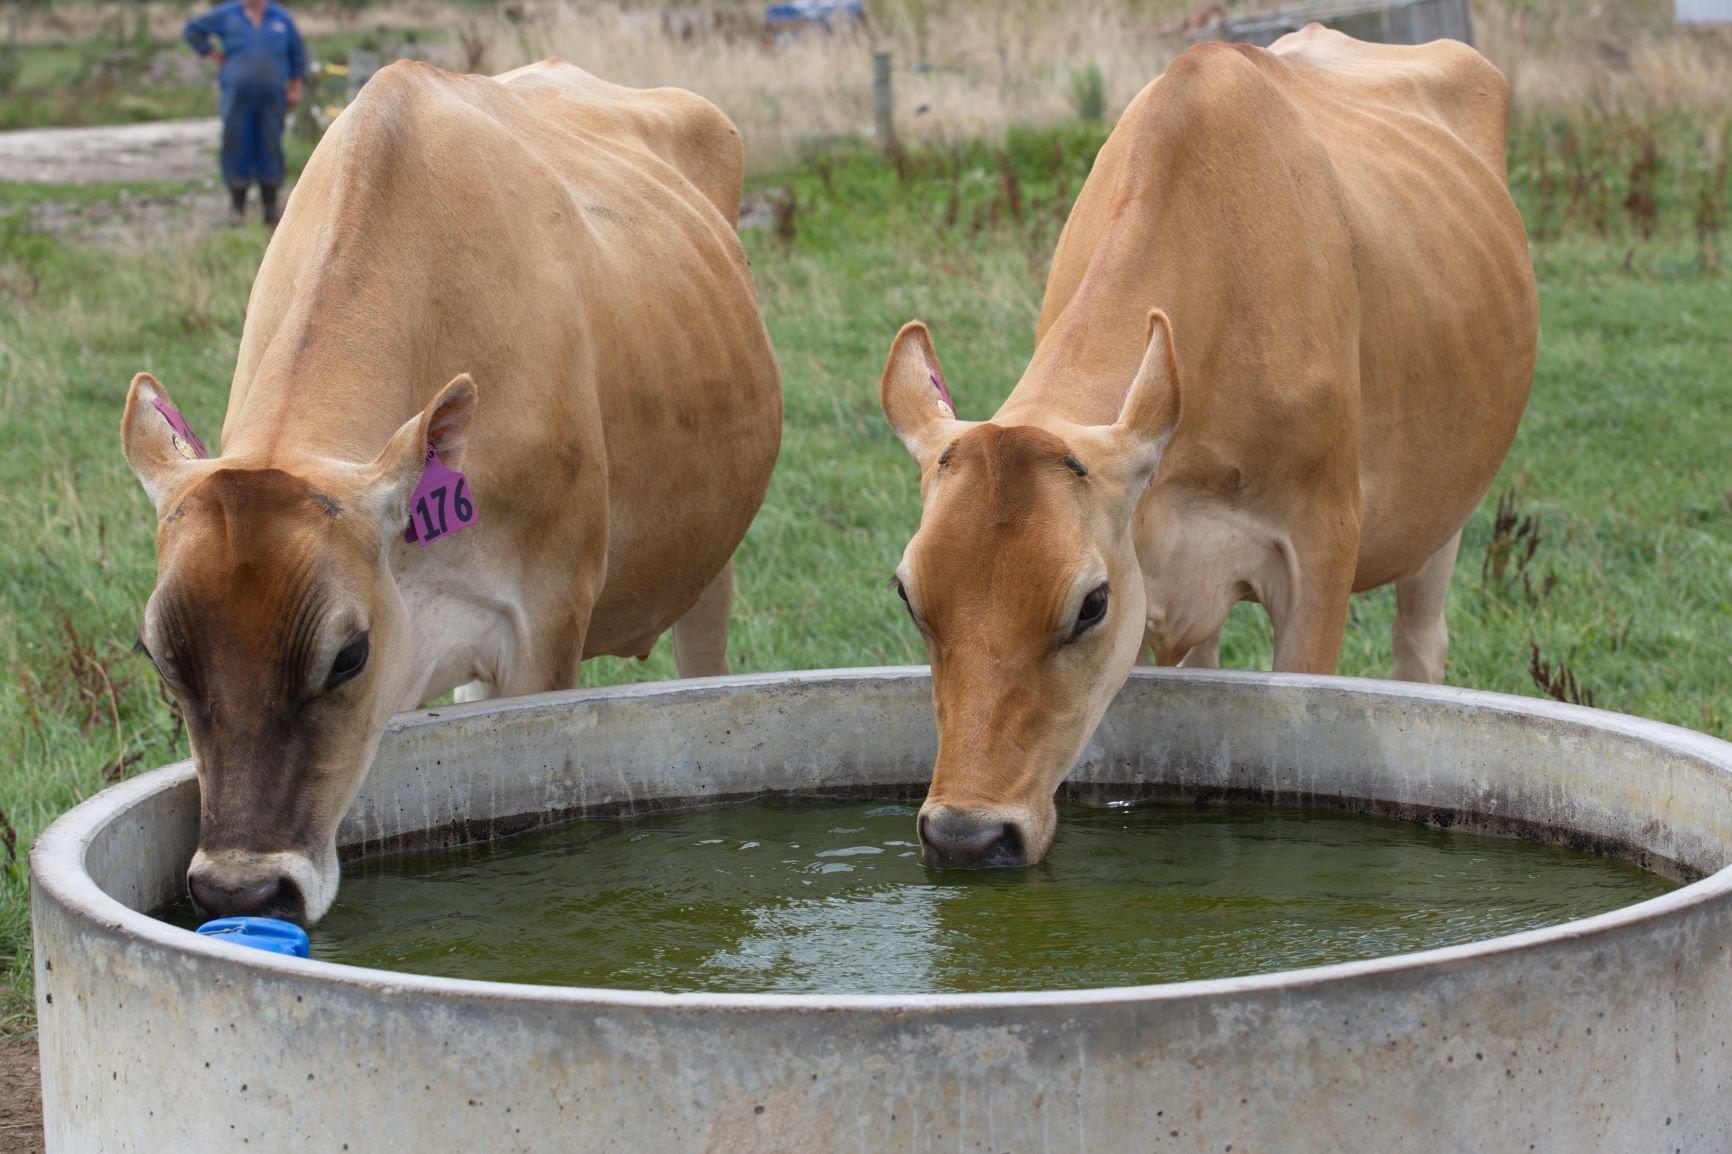 Jerseys drinking from trough